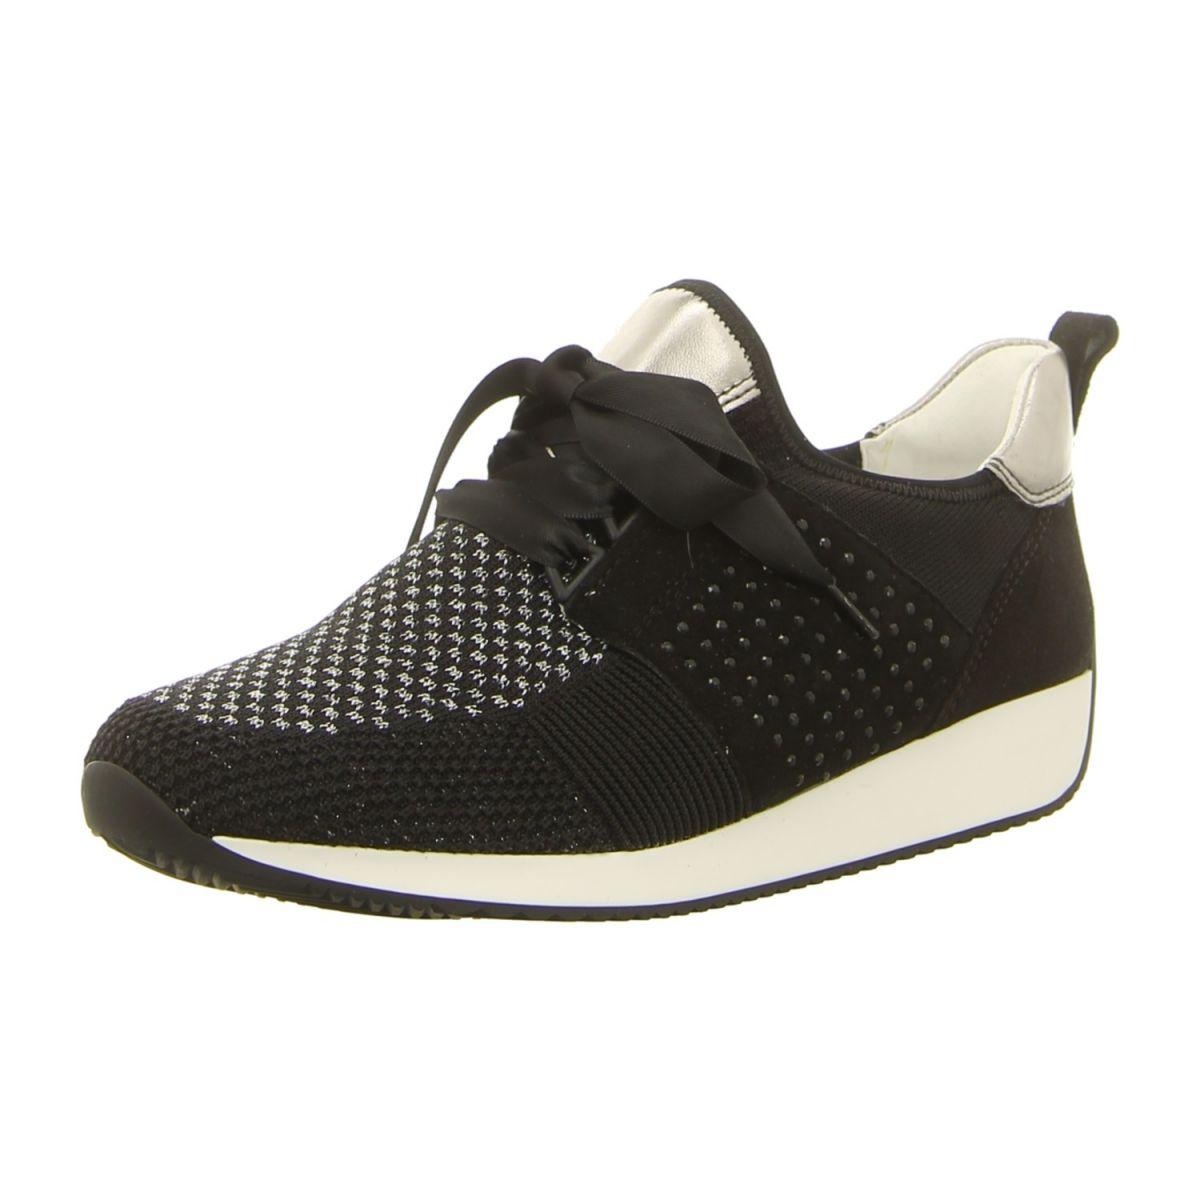 new arrival a9dc1 b0c40 NEU: Ara Sneaker Lissabon-Fusion4 - 12-34036-07 - schwarz ...